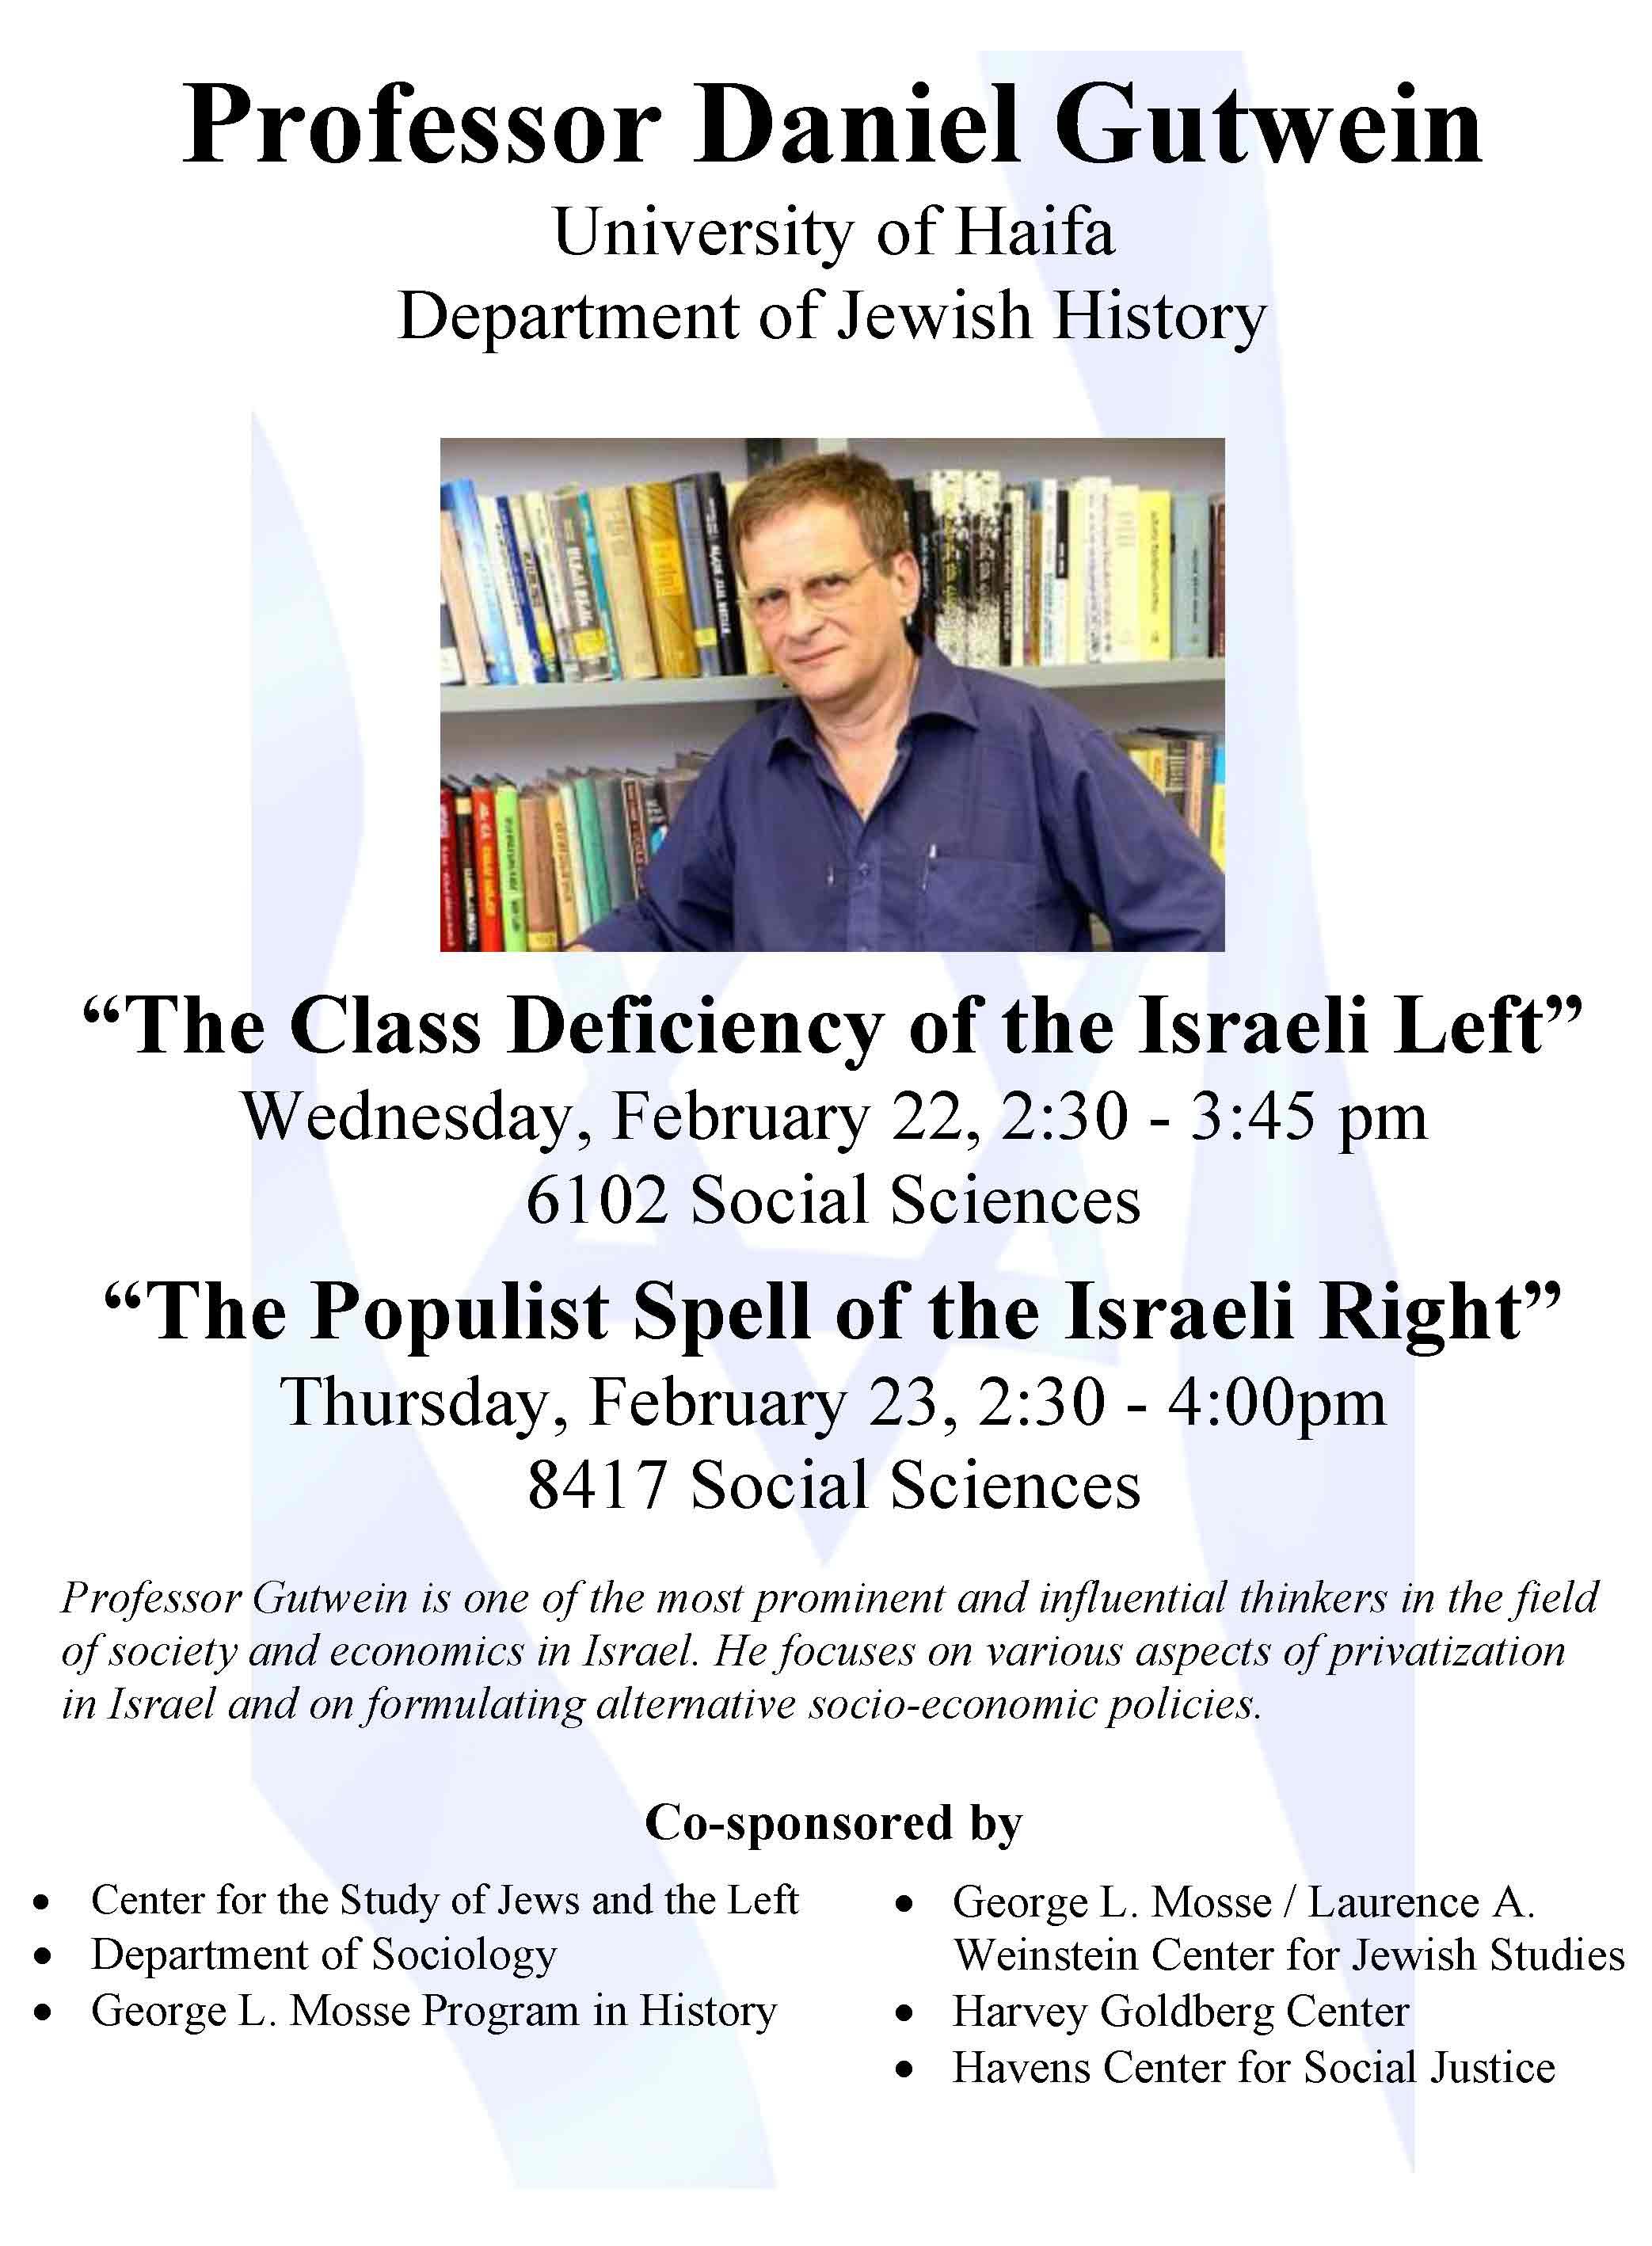 2017.02.22 - Daniel Gutwein - Israeli Politics 02